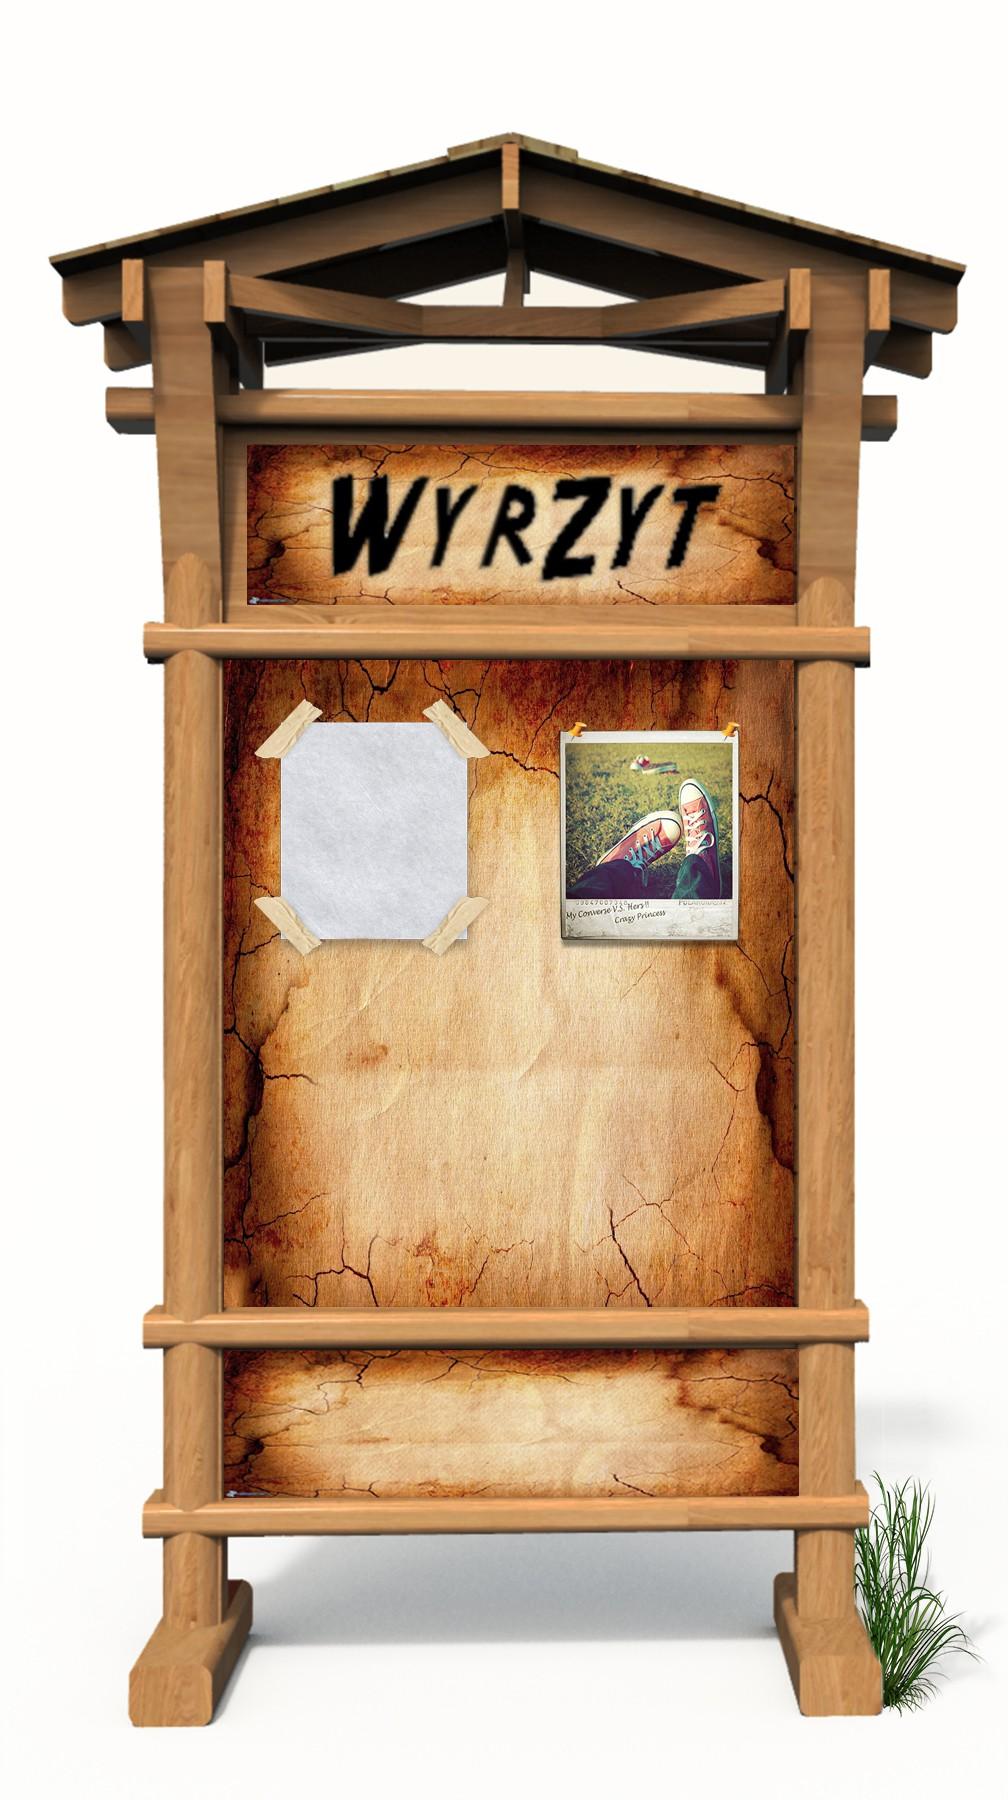 Help Wyrzyt with a new illustration